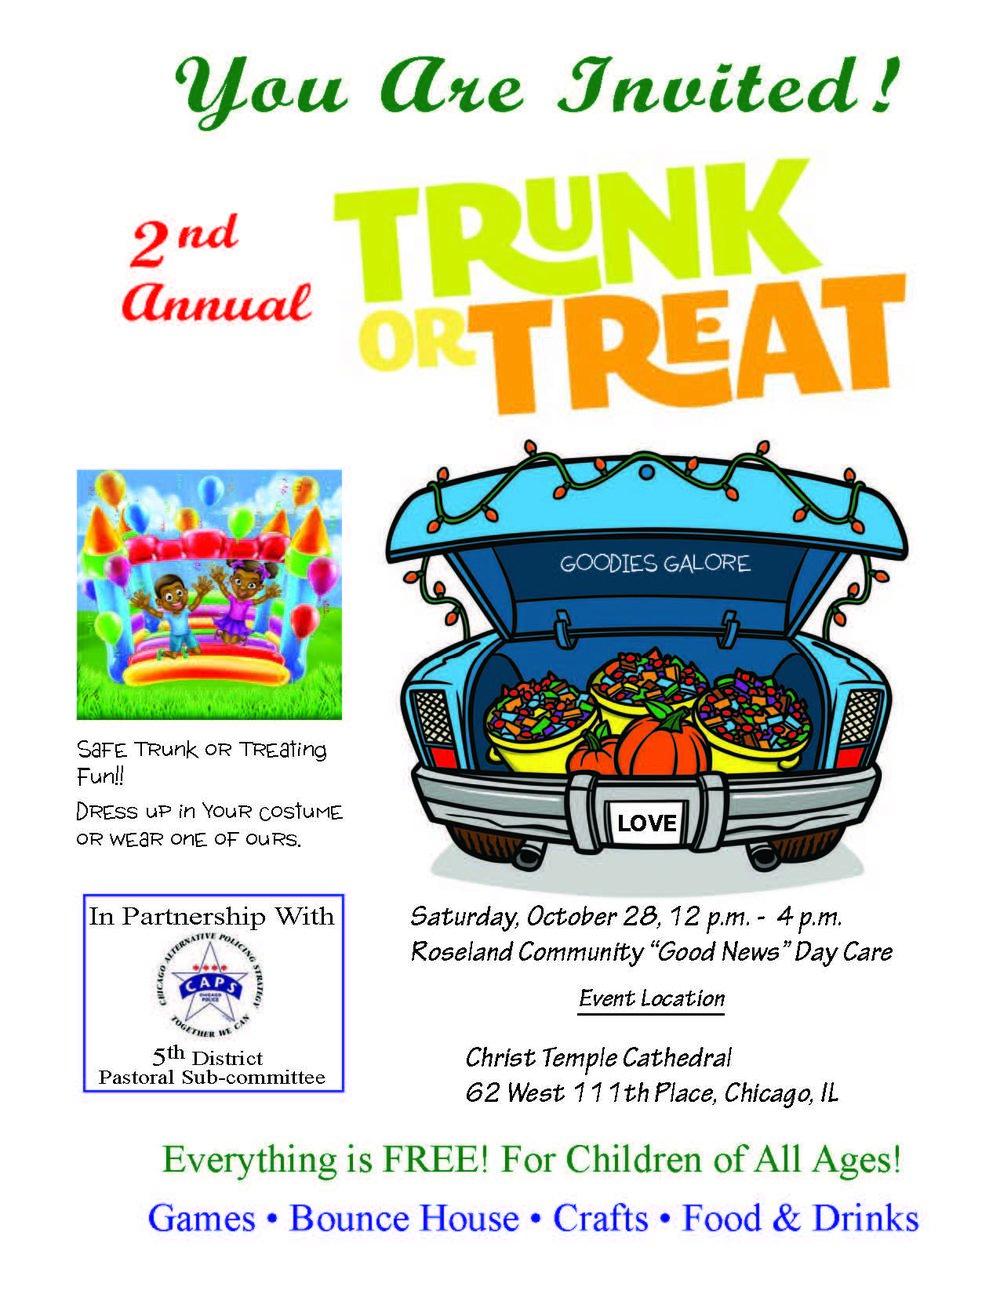 Trunk or Treat flyer 2nd annual.jpg